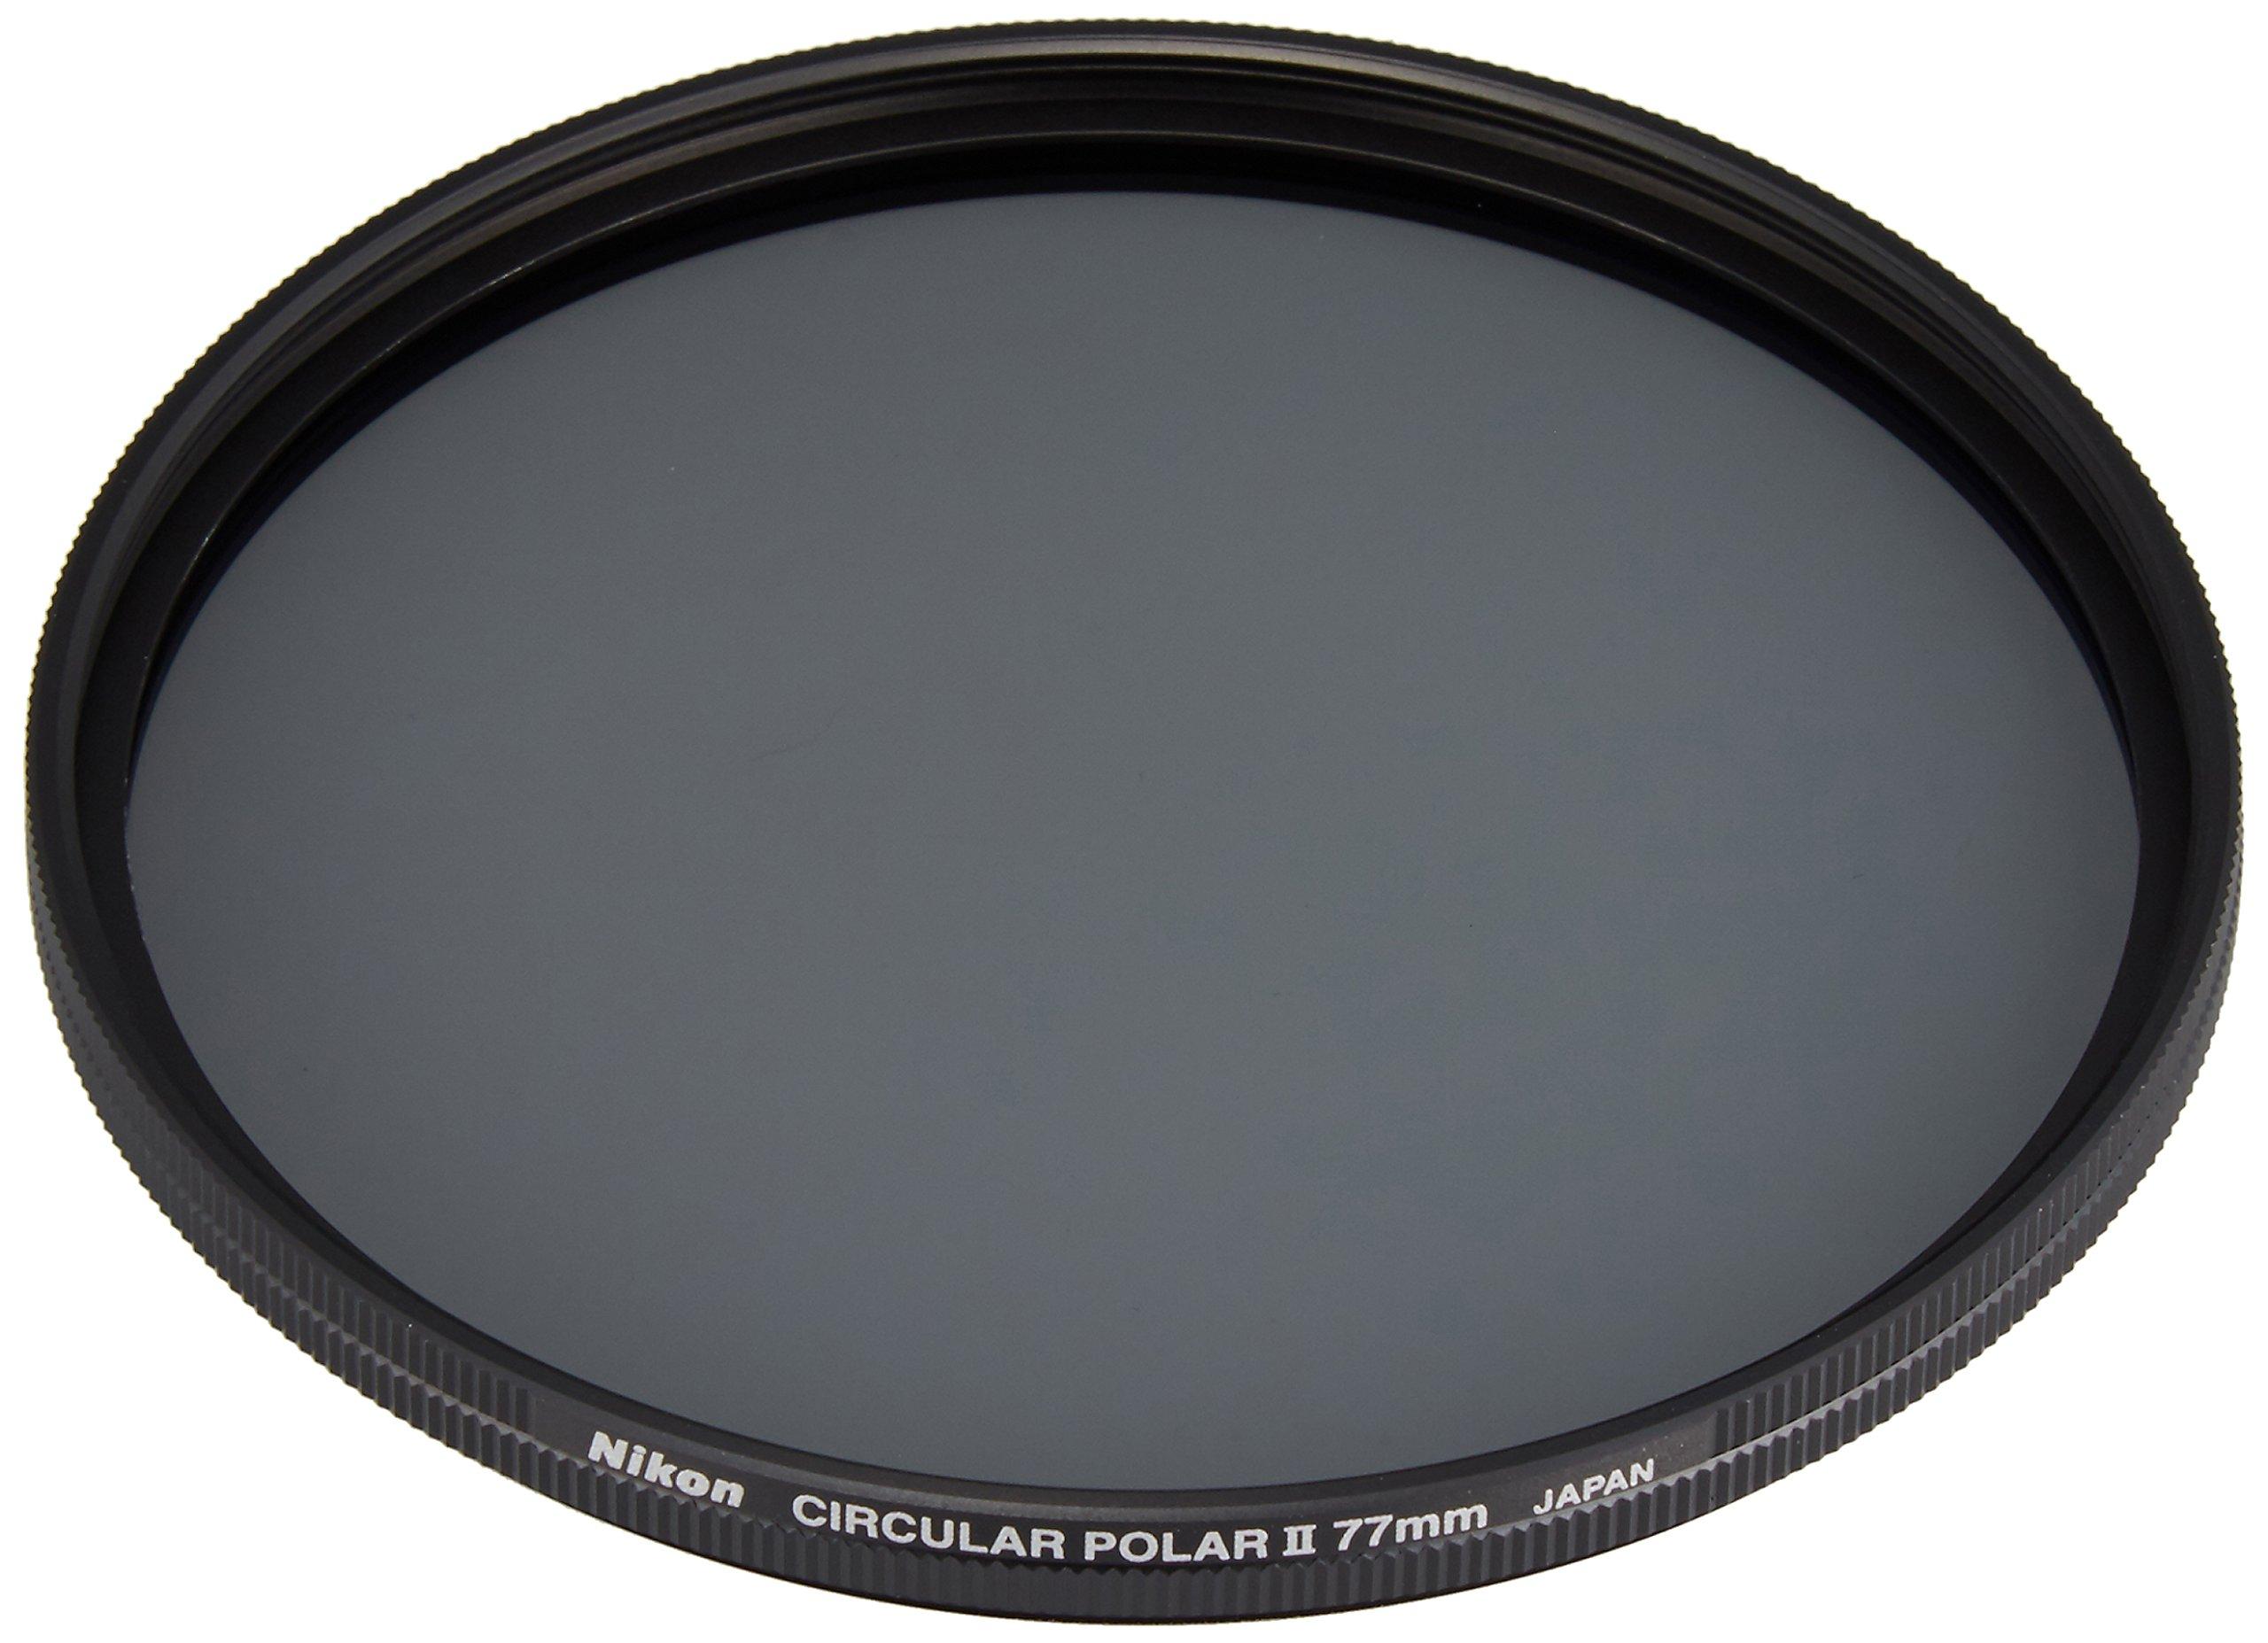 Nikon 77 mm Circular Polar II Filter by Nikon